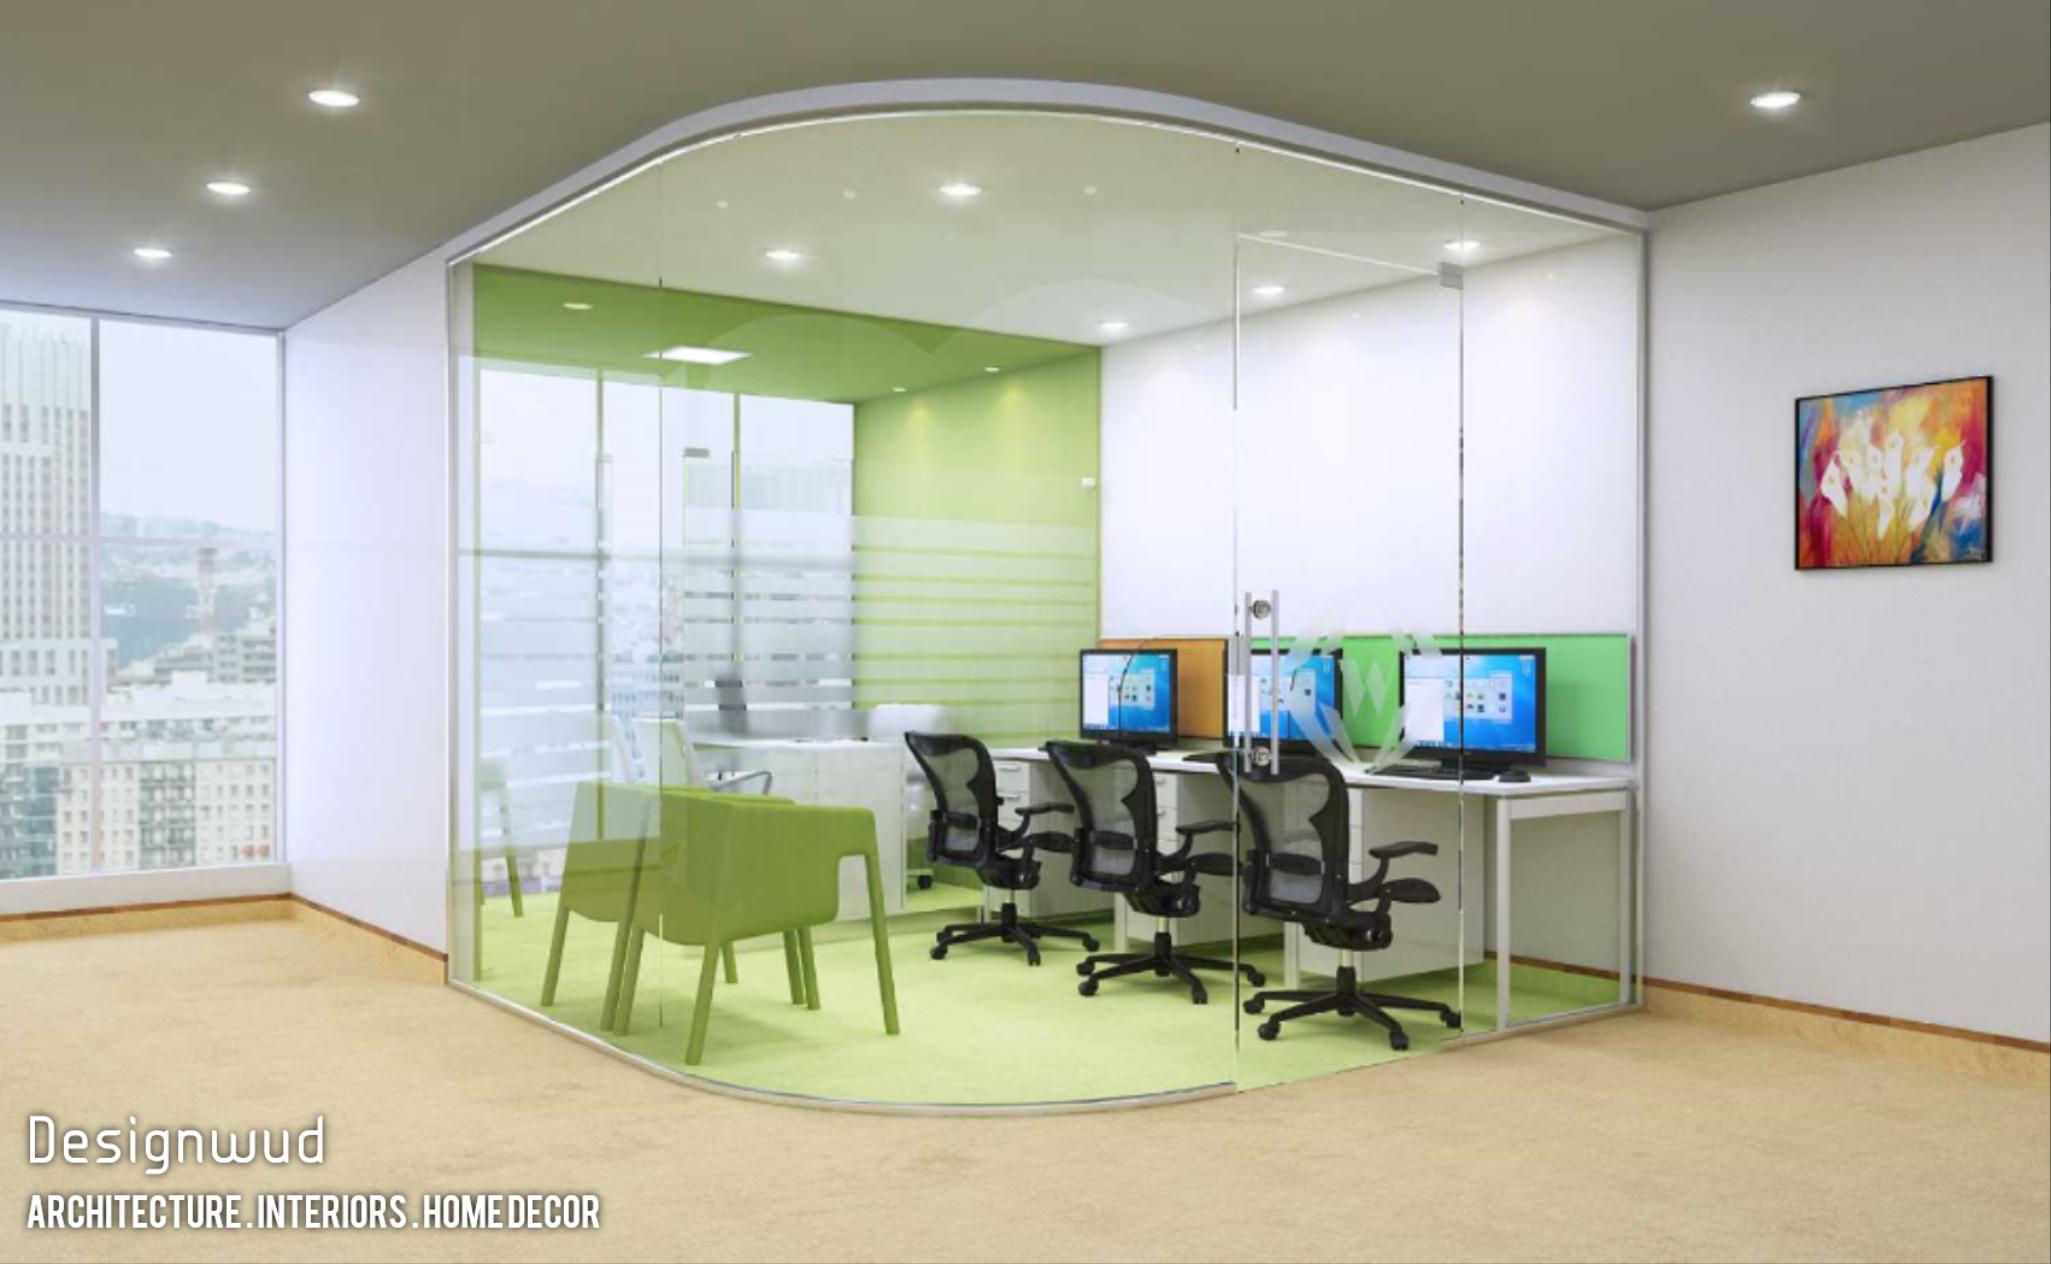 Top Architects Interior Designer In Delhi Ncr Office Interiors